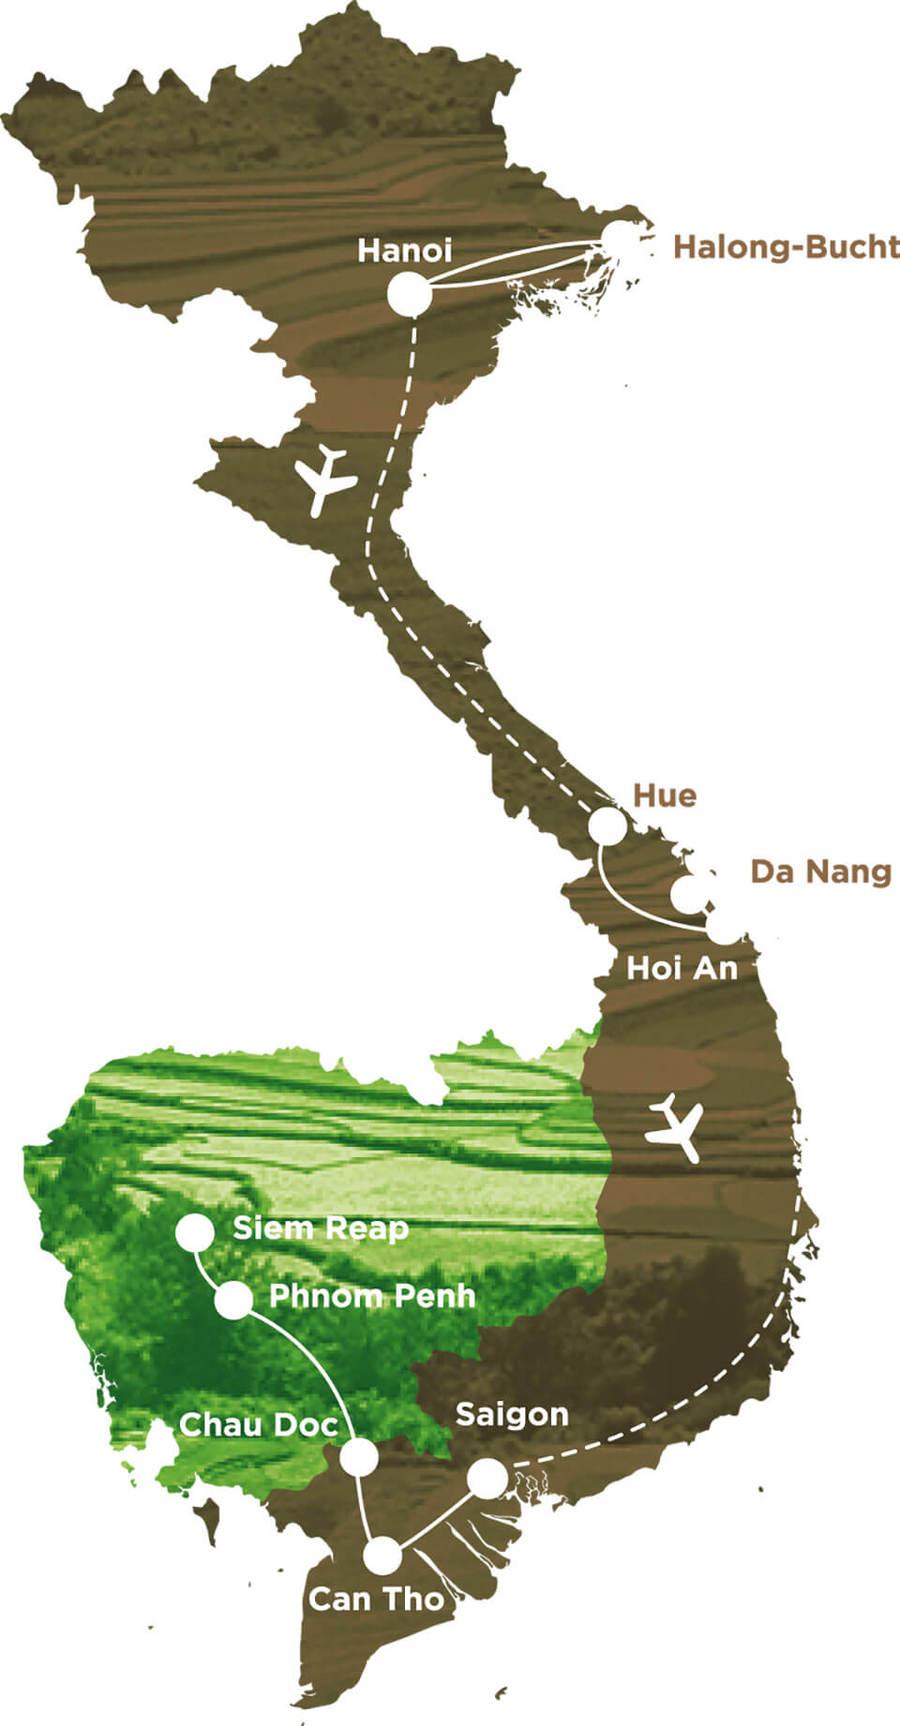 rundreise vietnam kambodscha mit kindern 15 tage. Black Bedroom Furniture Sets. Home Design Ideas